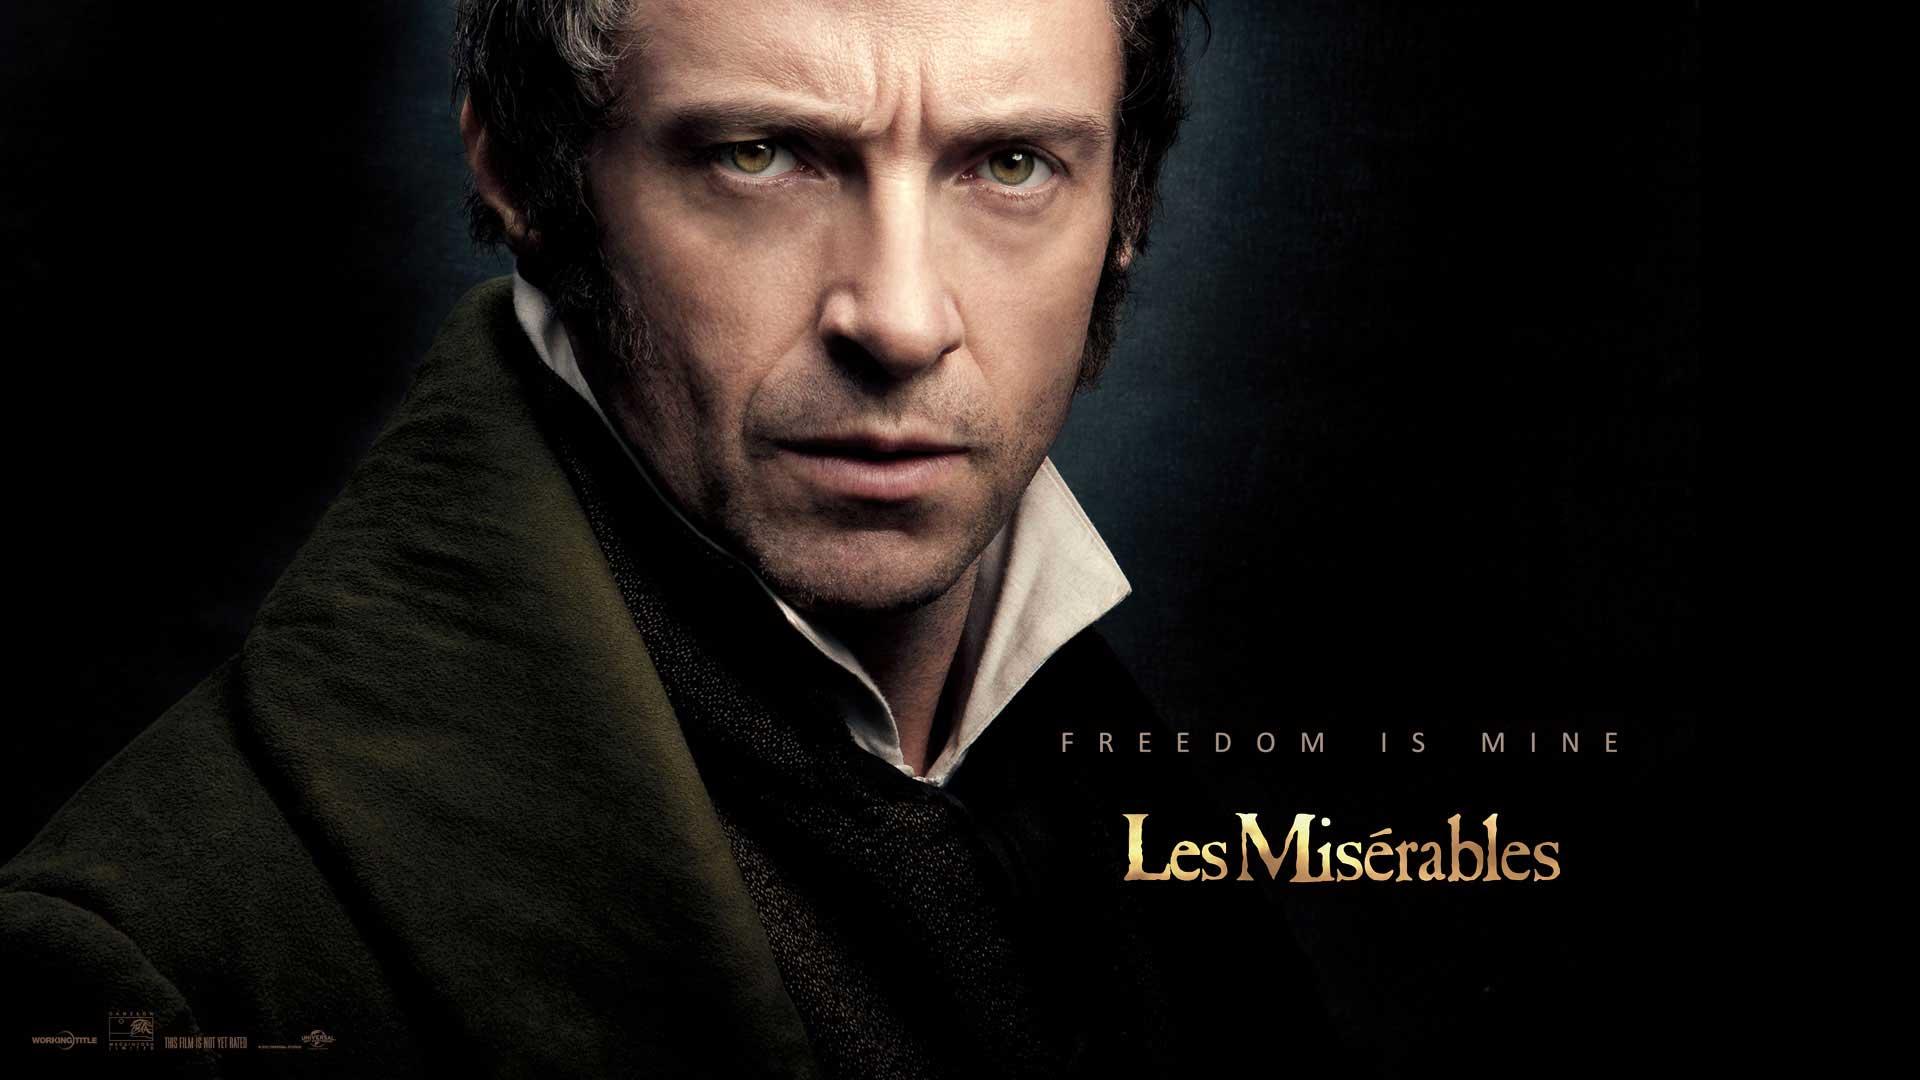 Les Miserables Golden Globes